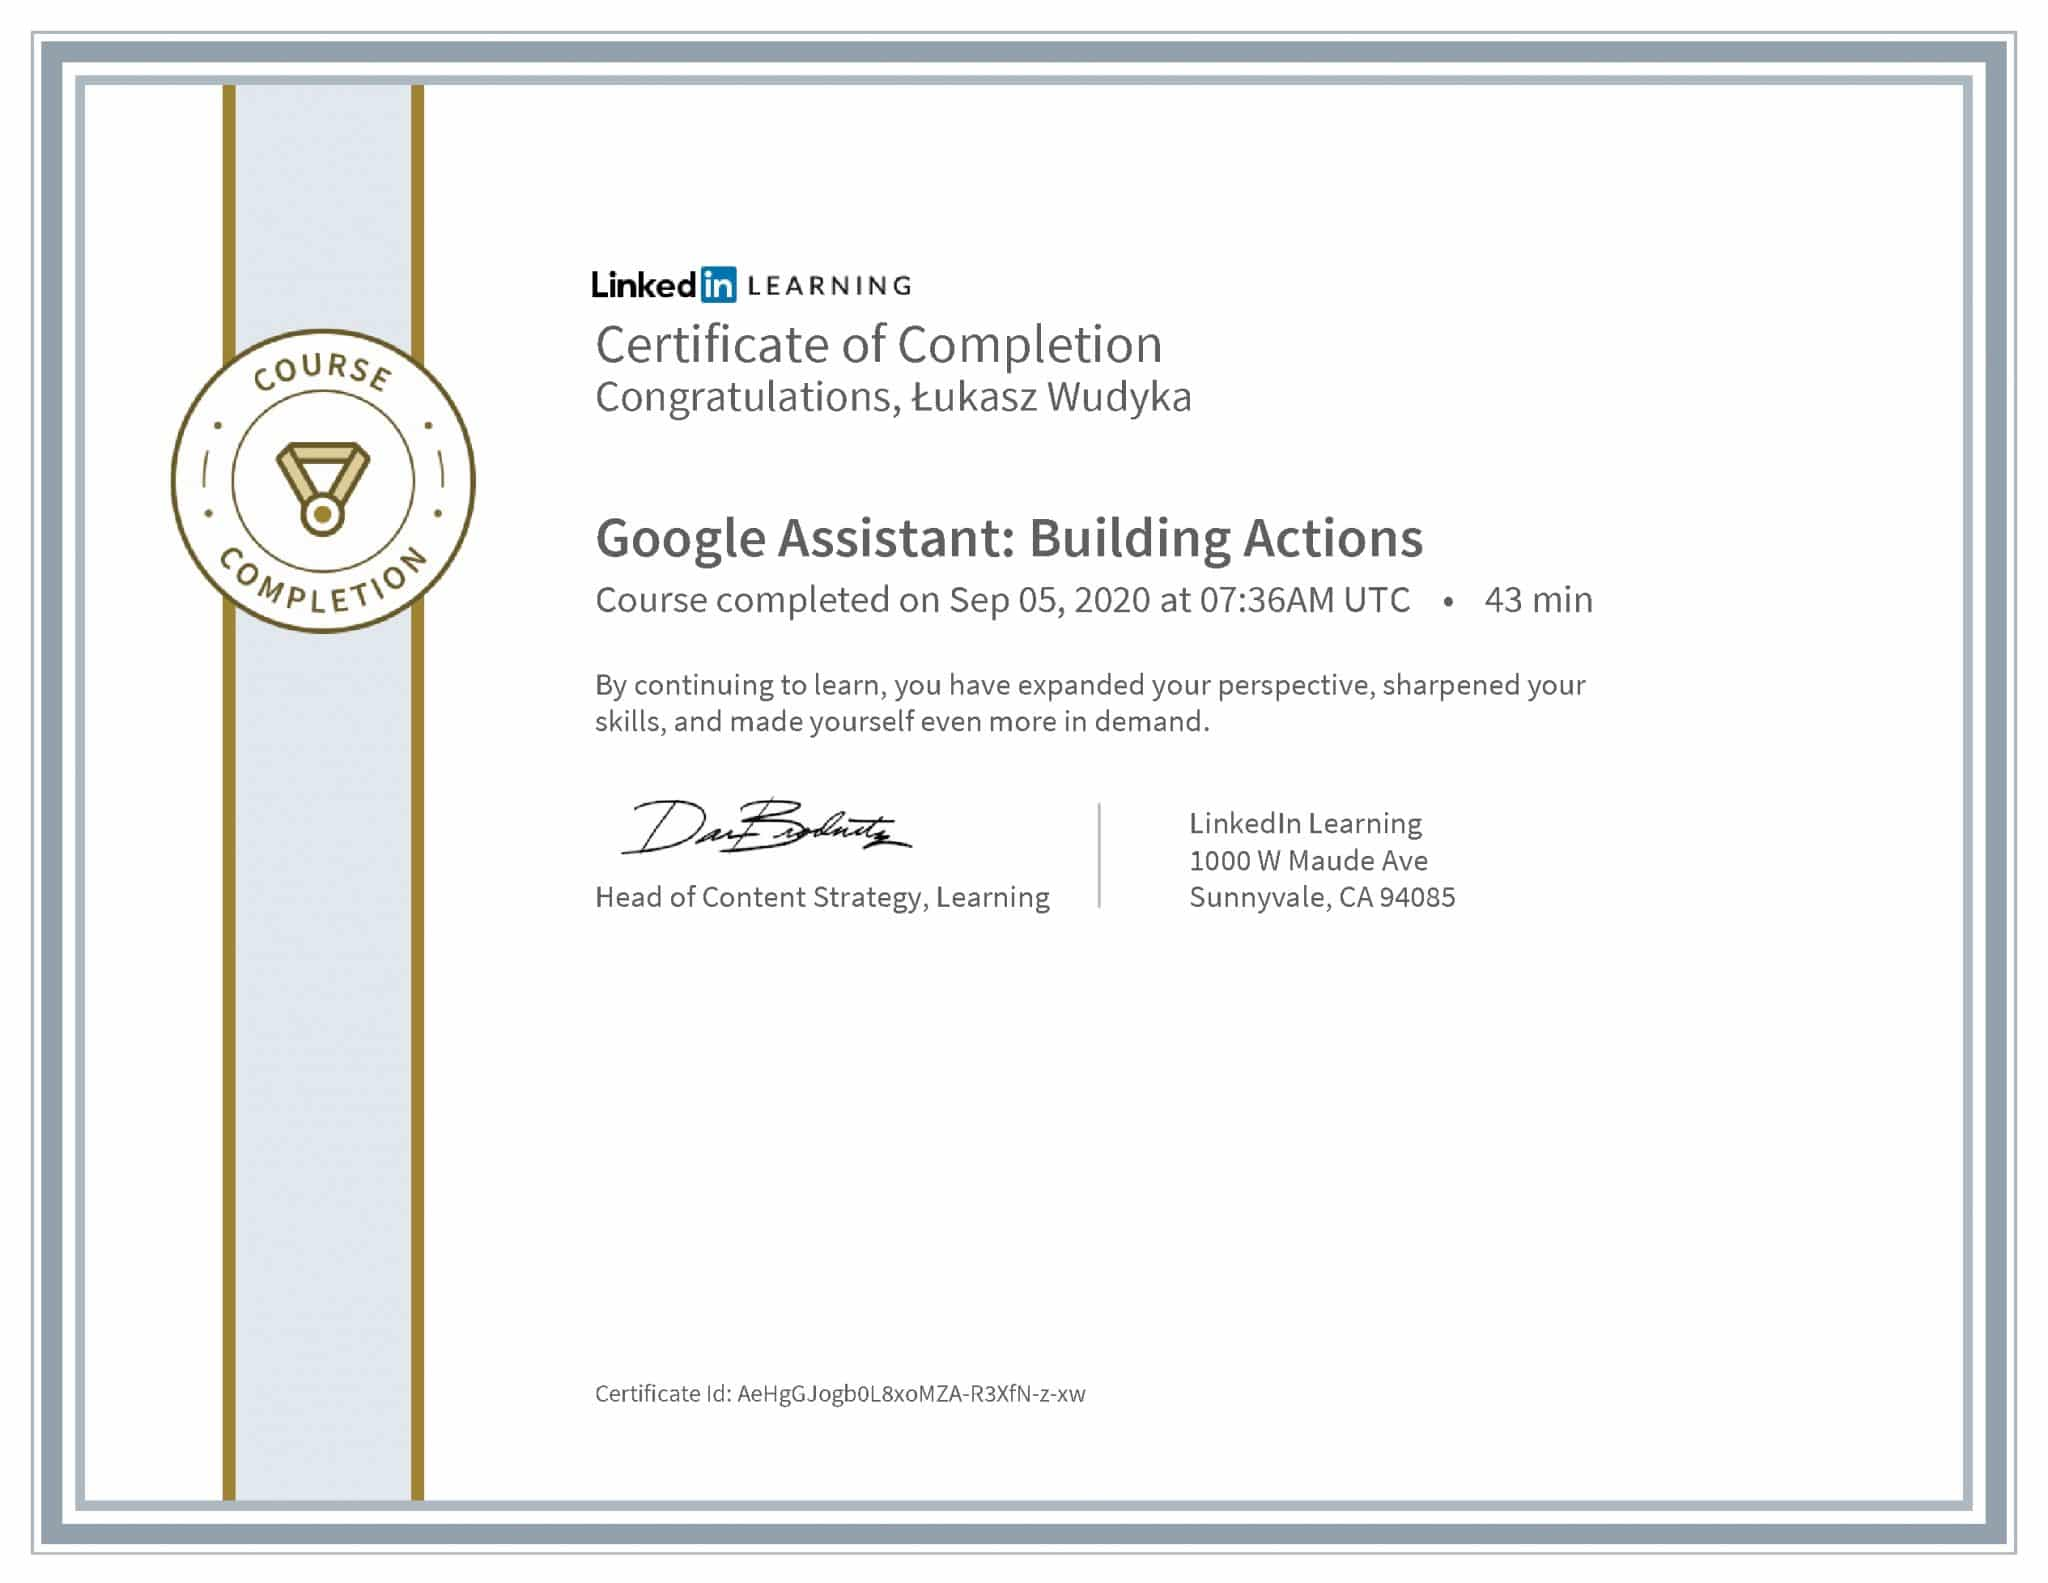 Łukasz Wudyka certyfikat LinkedIn Google Assistant: Building Actions